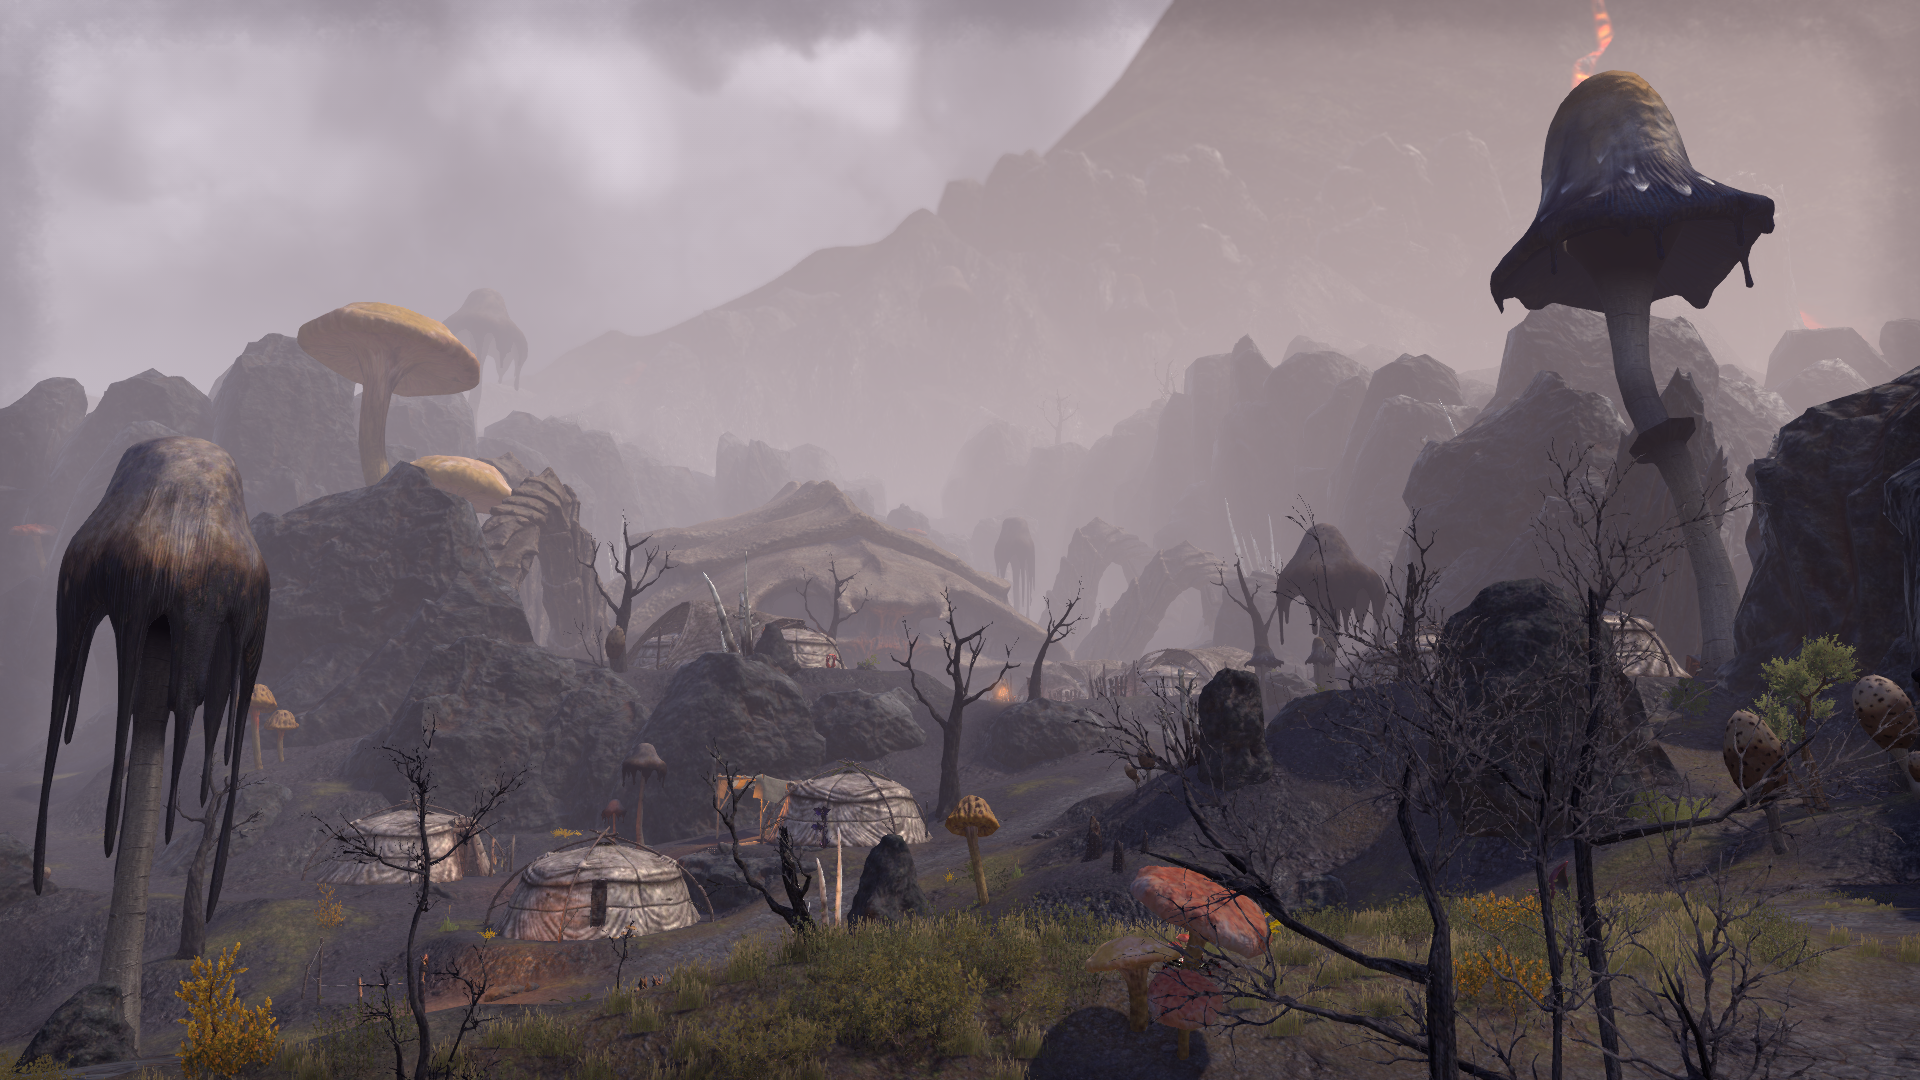 Альд'рун (Online: Morrowind)